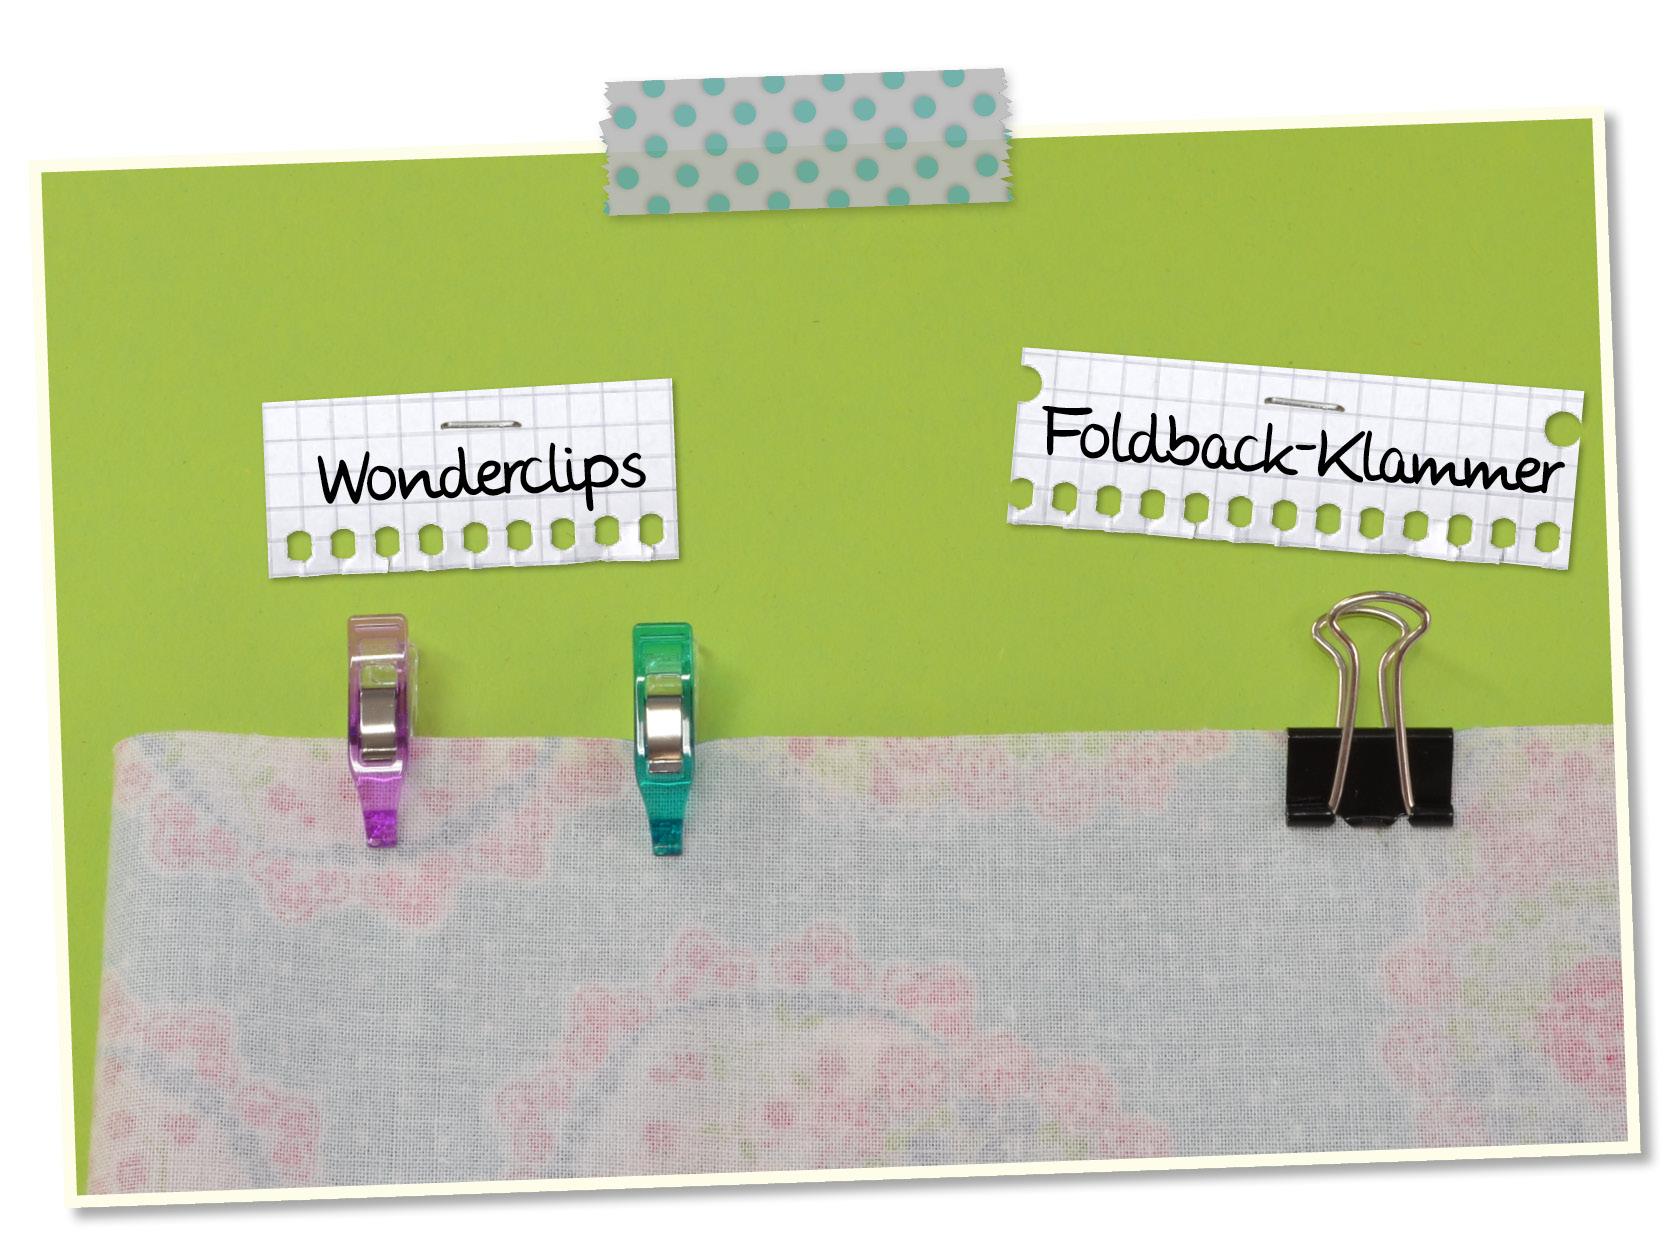 Nählexikon, Nähen, Nähzimmer, Nähen für Anfänger, Gratisanleitung, Wonder-Clips, Foldback